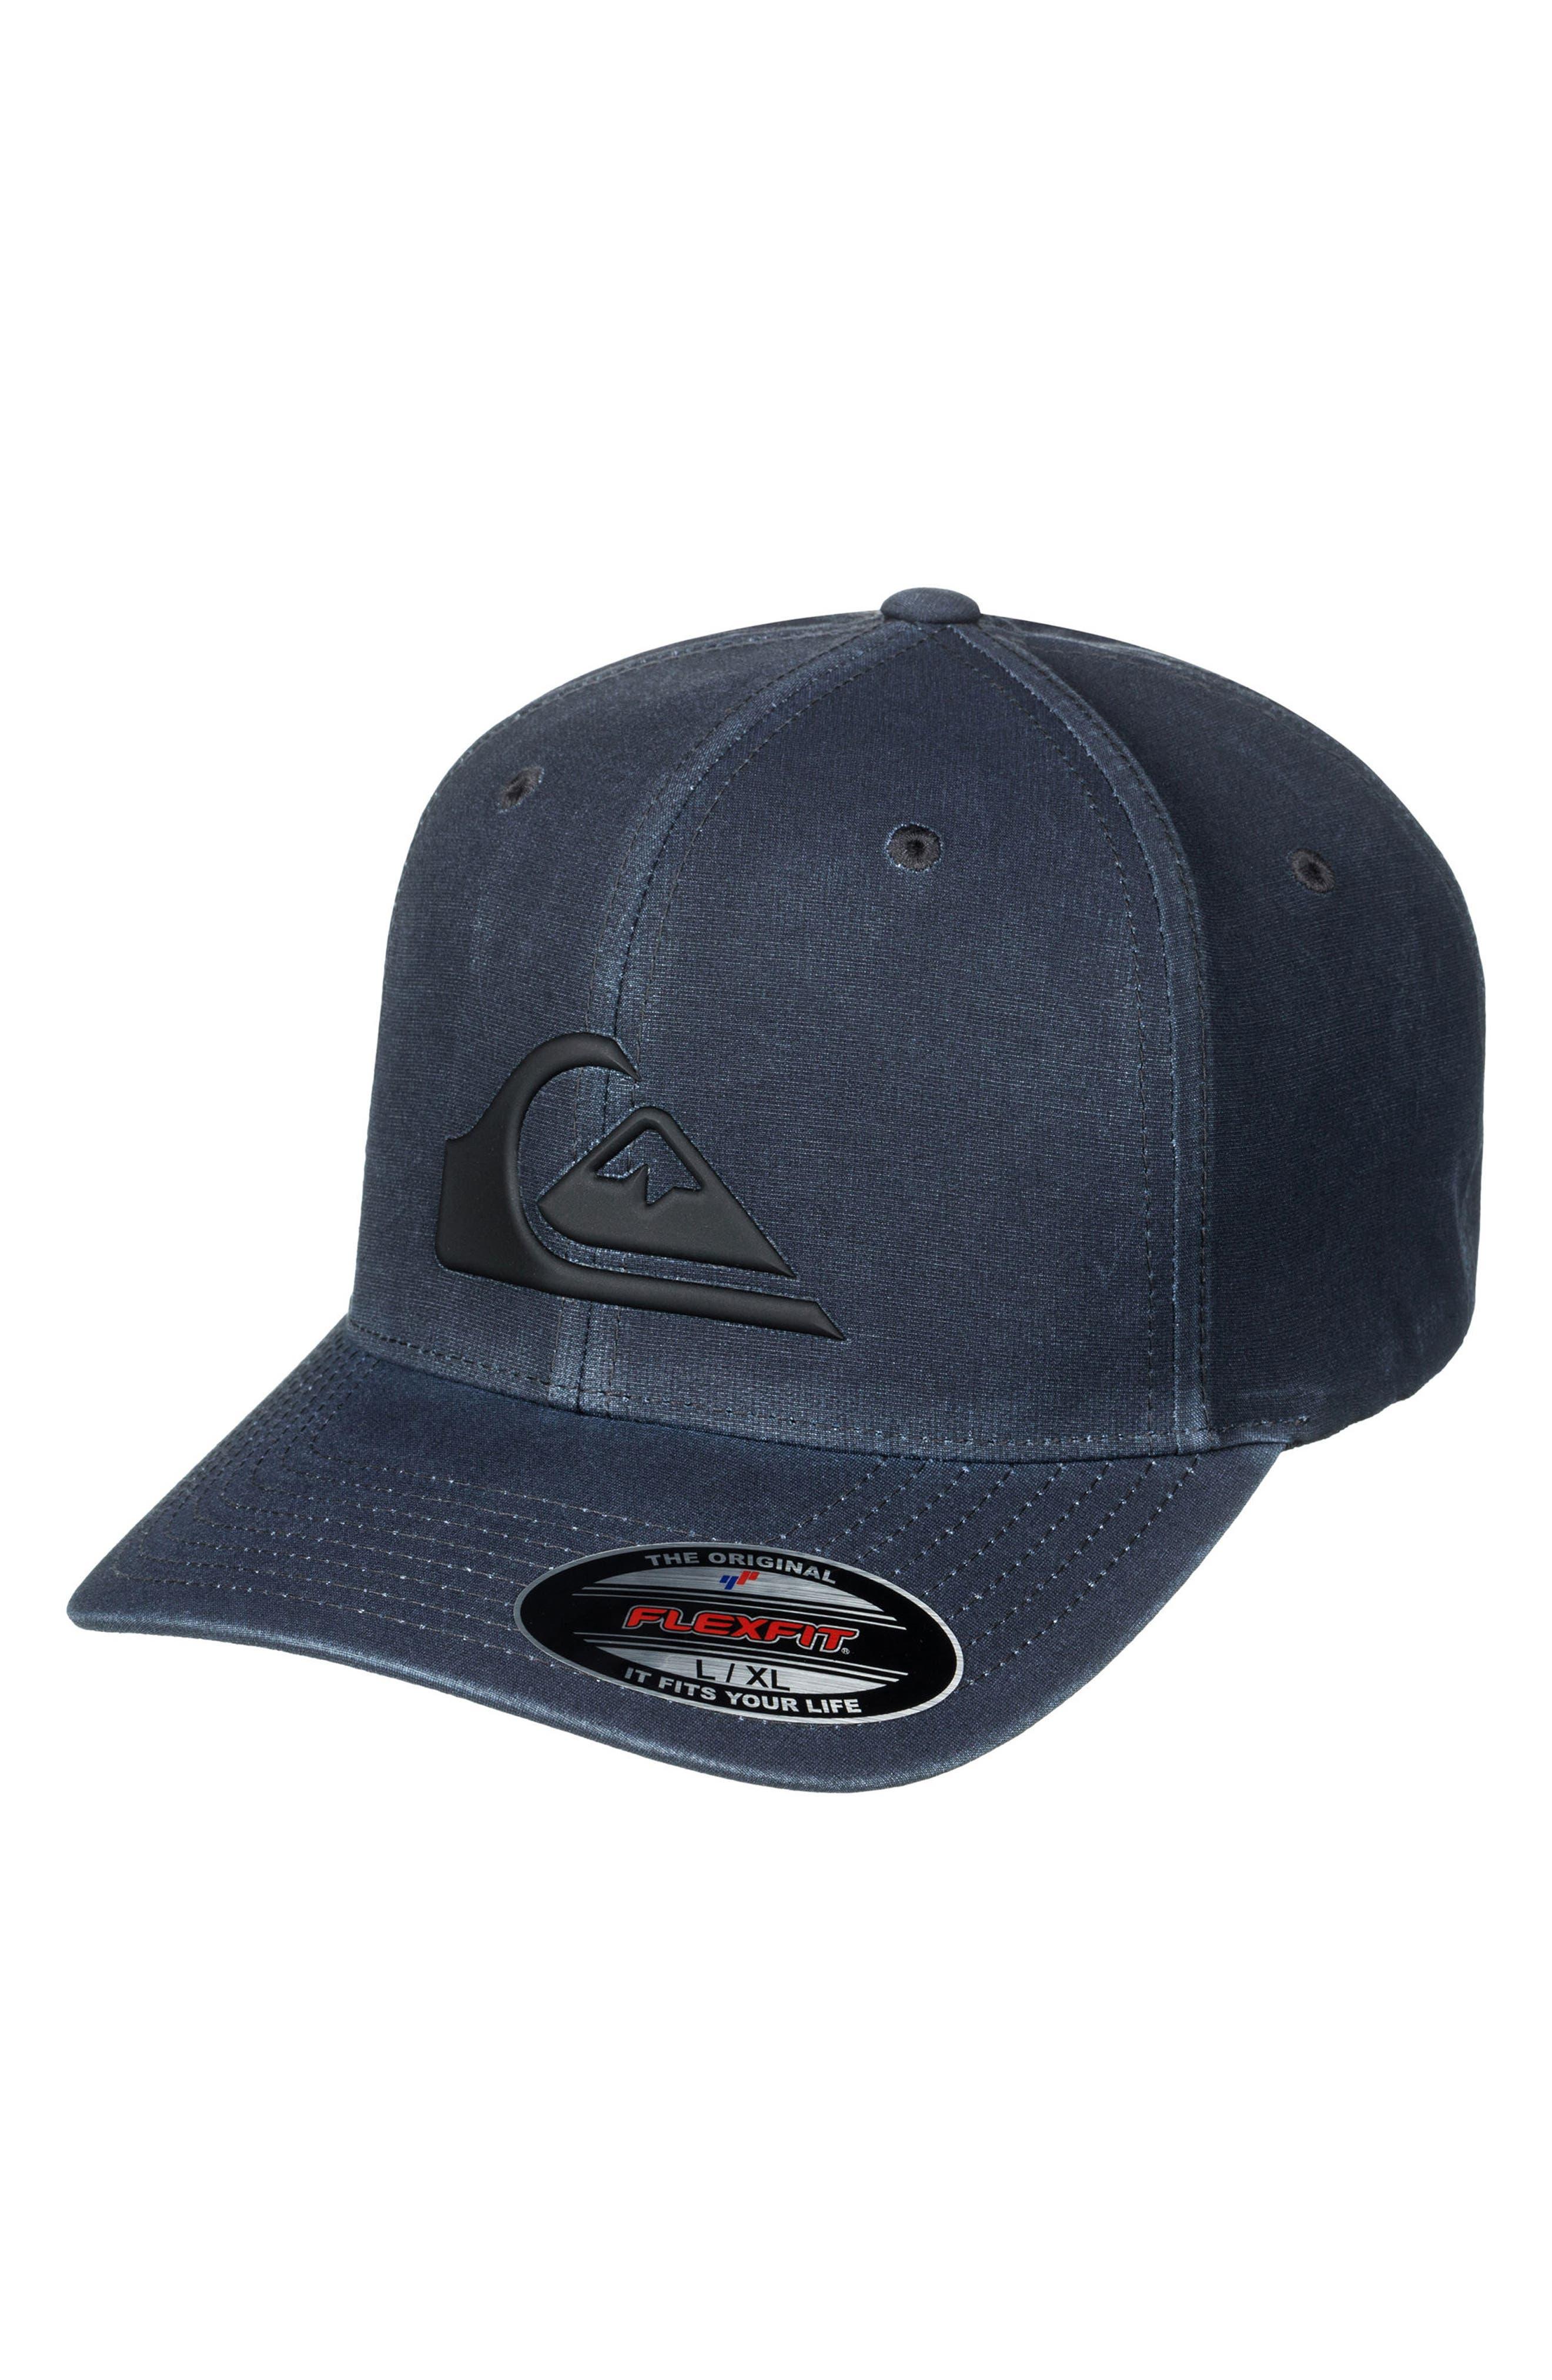 Union Flex Fit Baseball Cap,                             Main thumbnail 1, color,                             Black